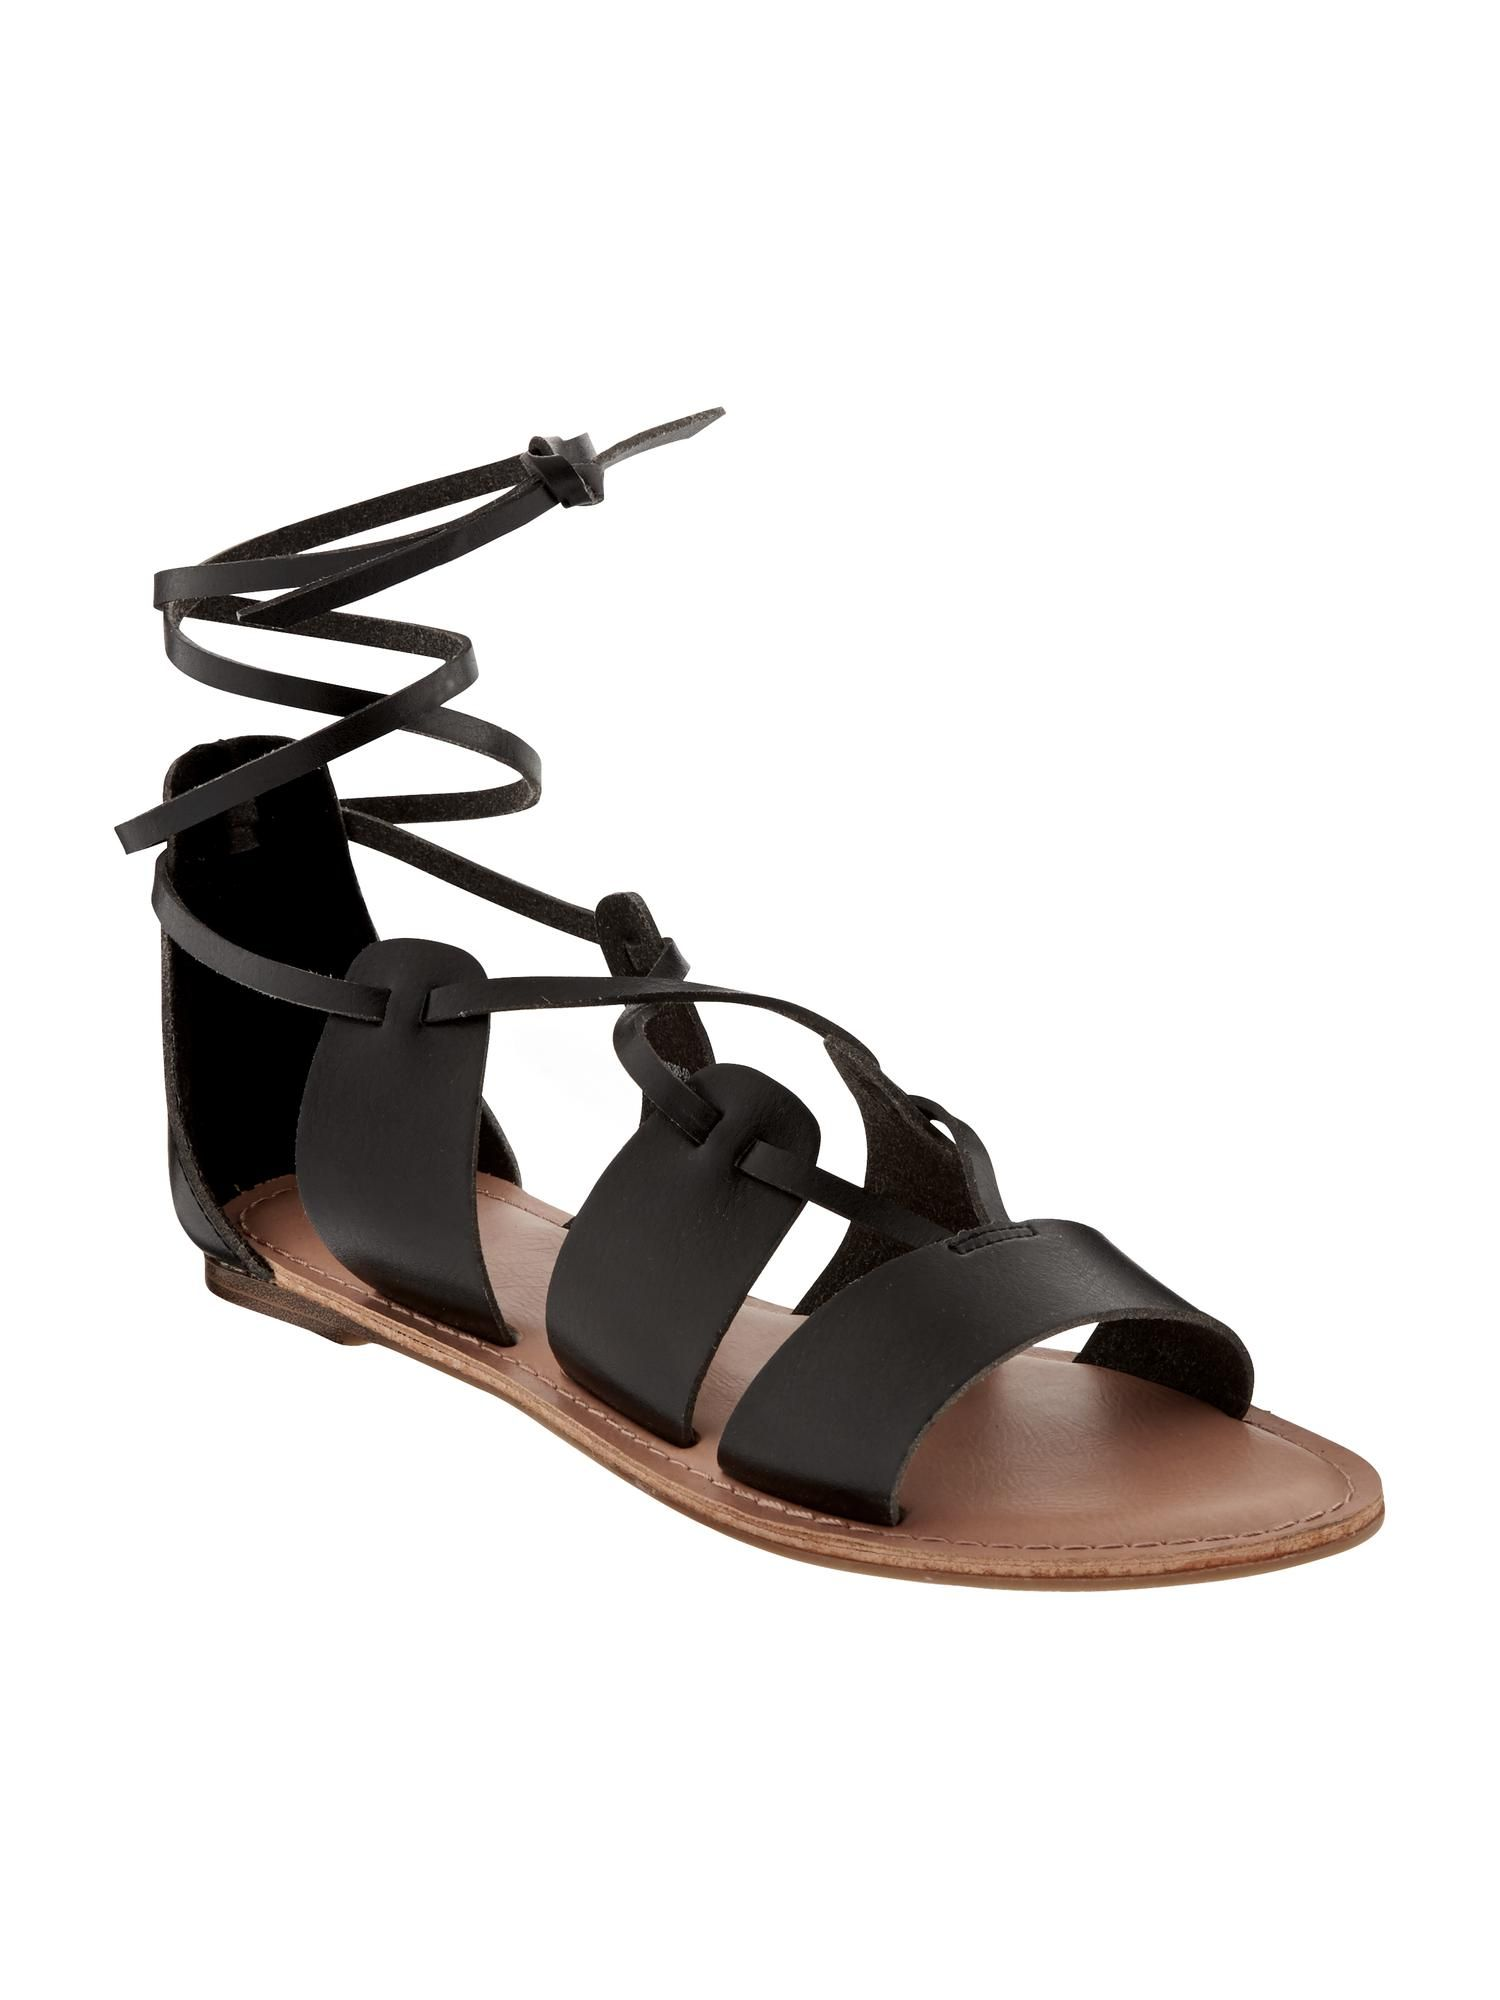 Black sandals old navy - Lace Up Gladiator Sandals For Women Old Navy